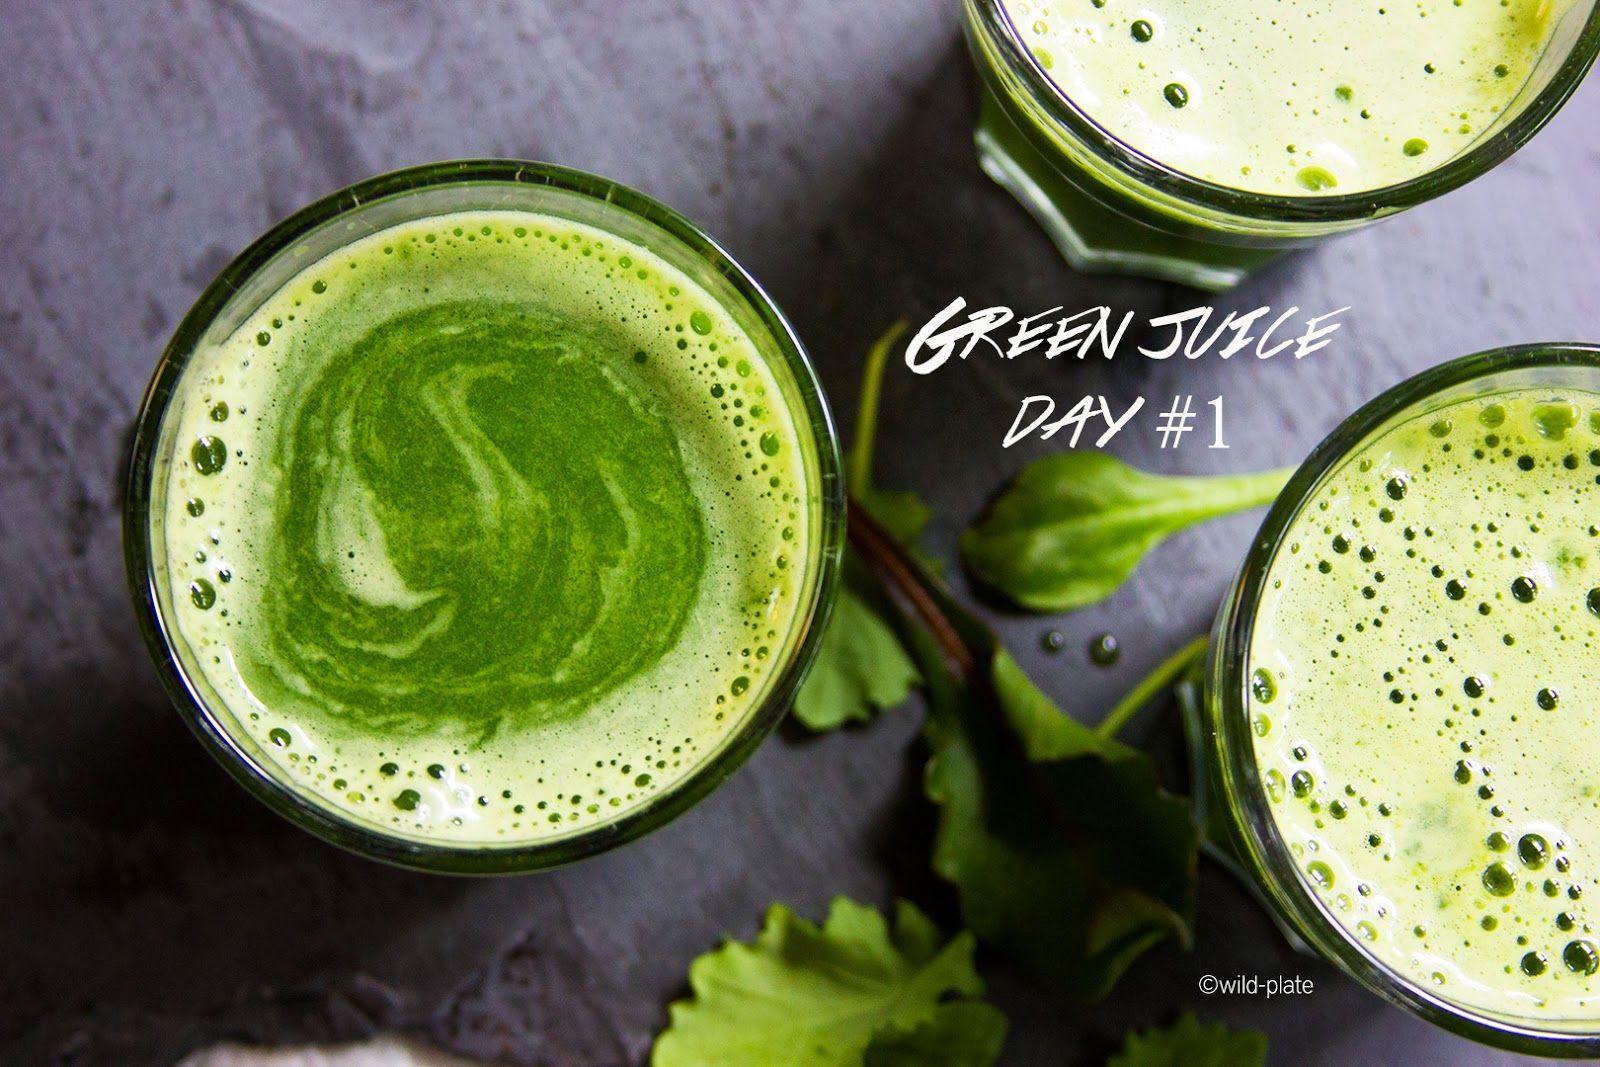 28 day juice challenge